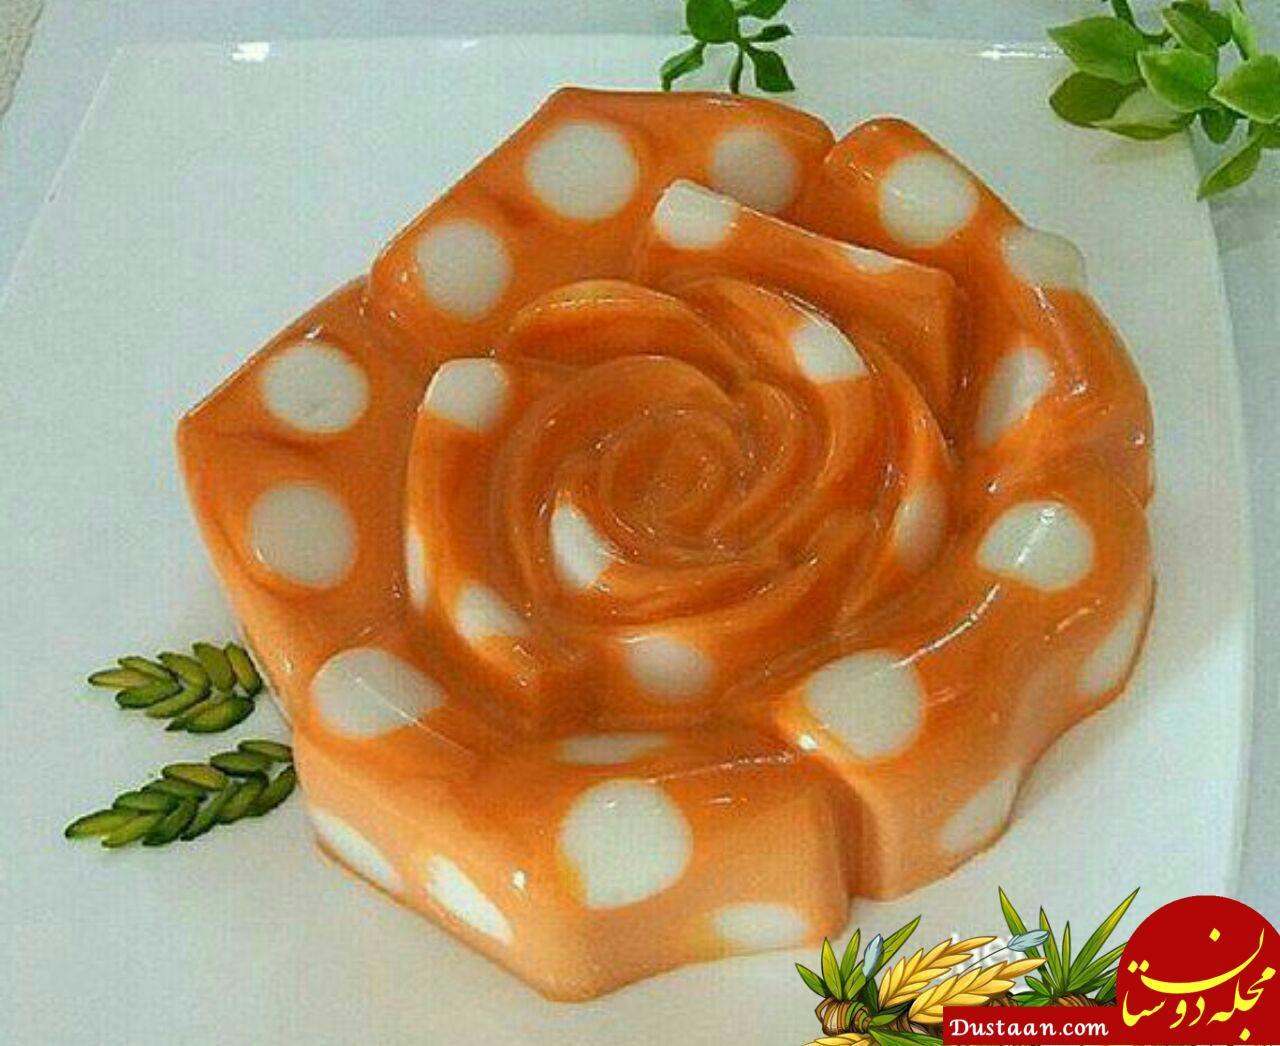 www.dustaan.com طرز تهیه دسر هویج به سبکی خوشمزه